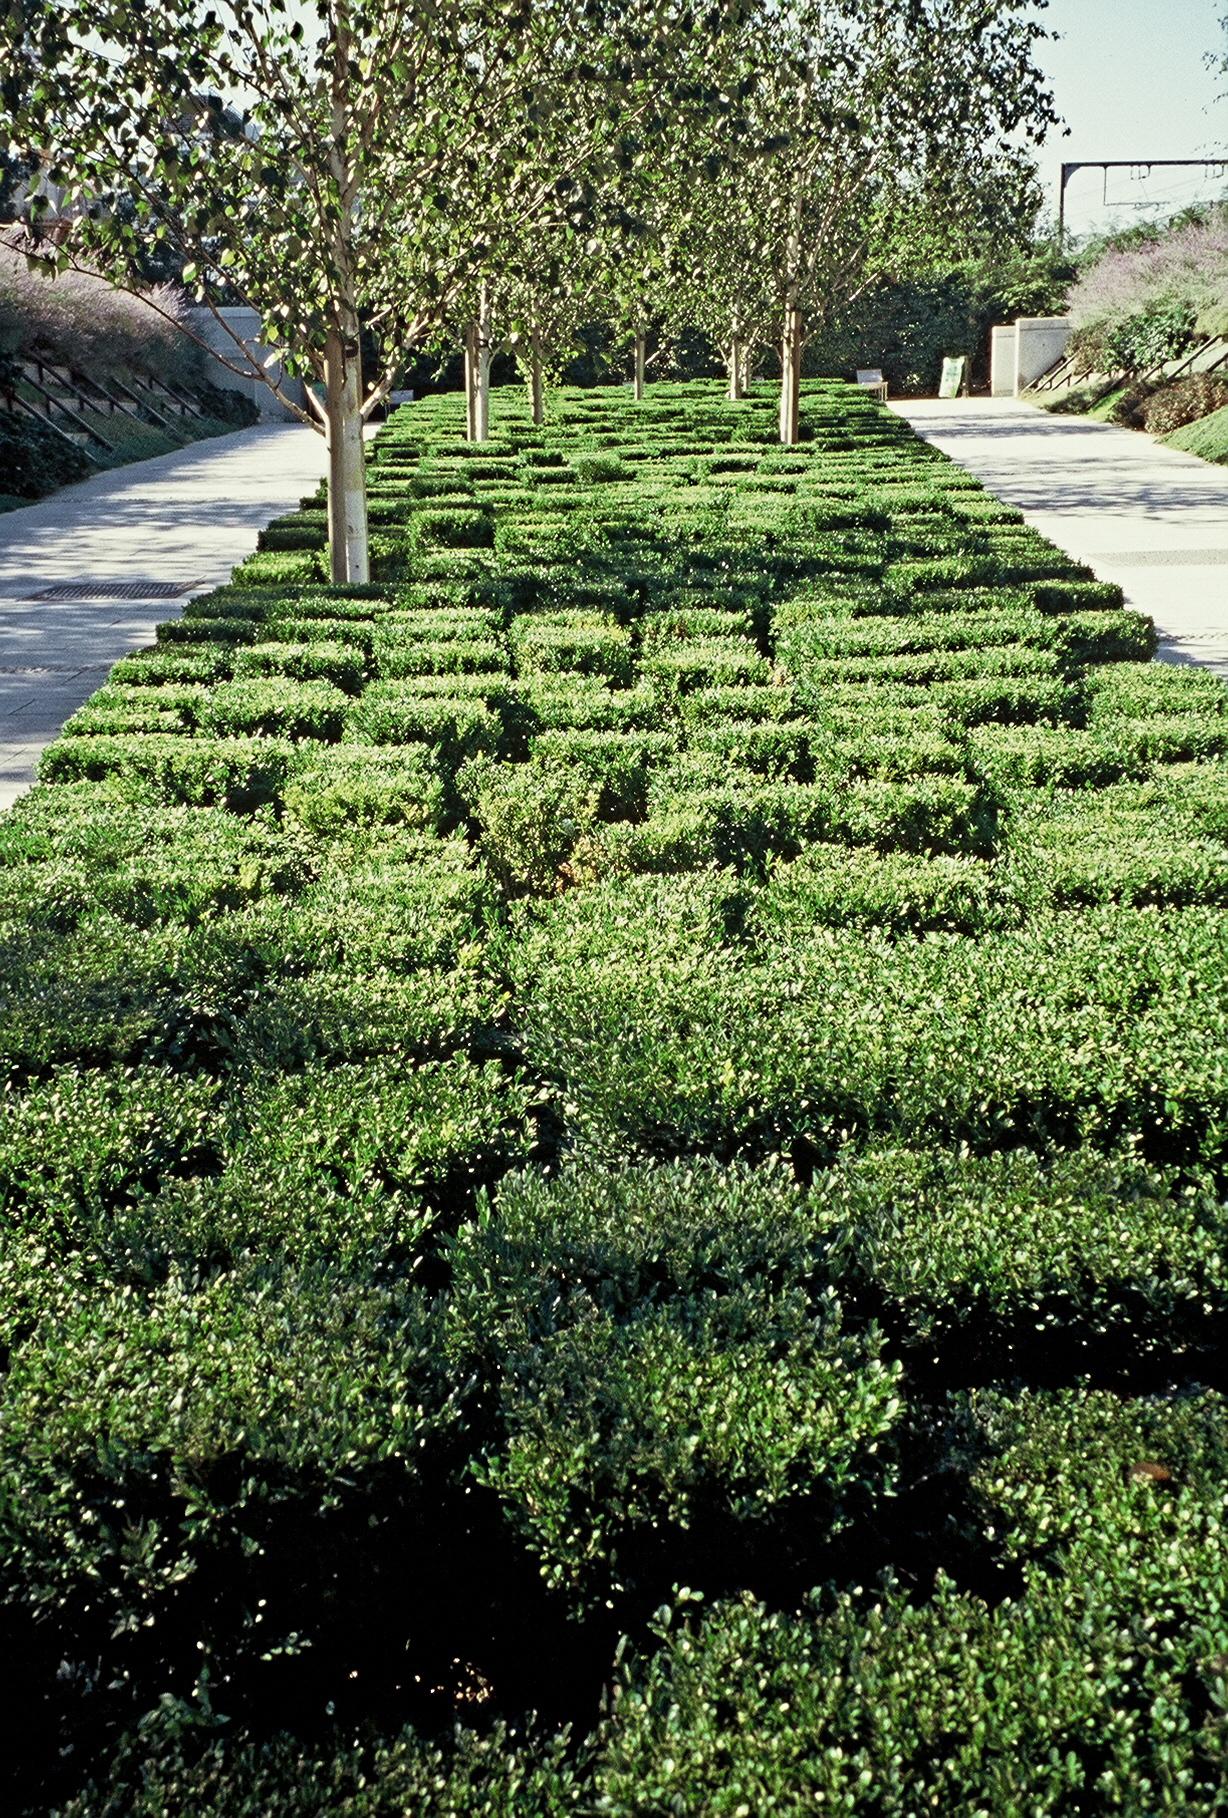 paris parc citro n photo alice joyce alice 39 s garden travel buzz. Black Bedroom Furniture Sets. Home Design Ideas